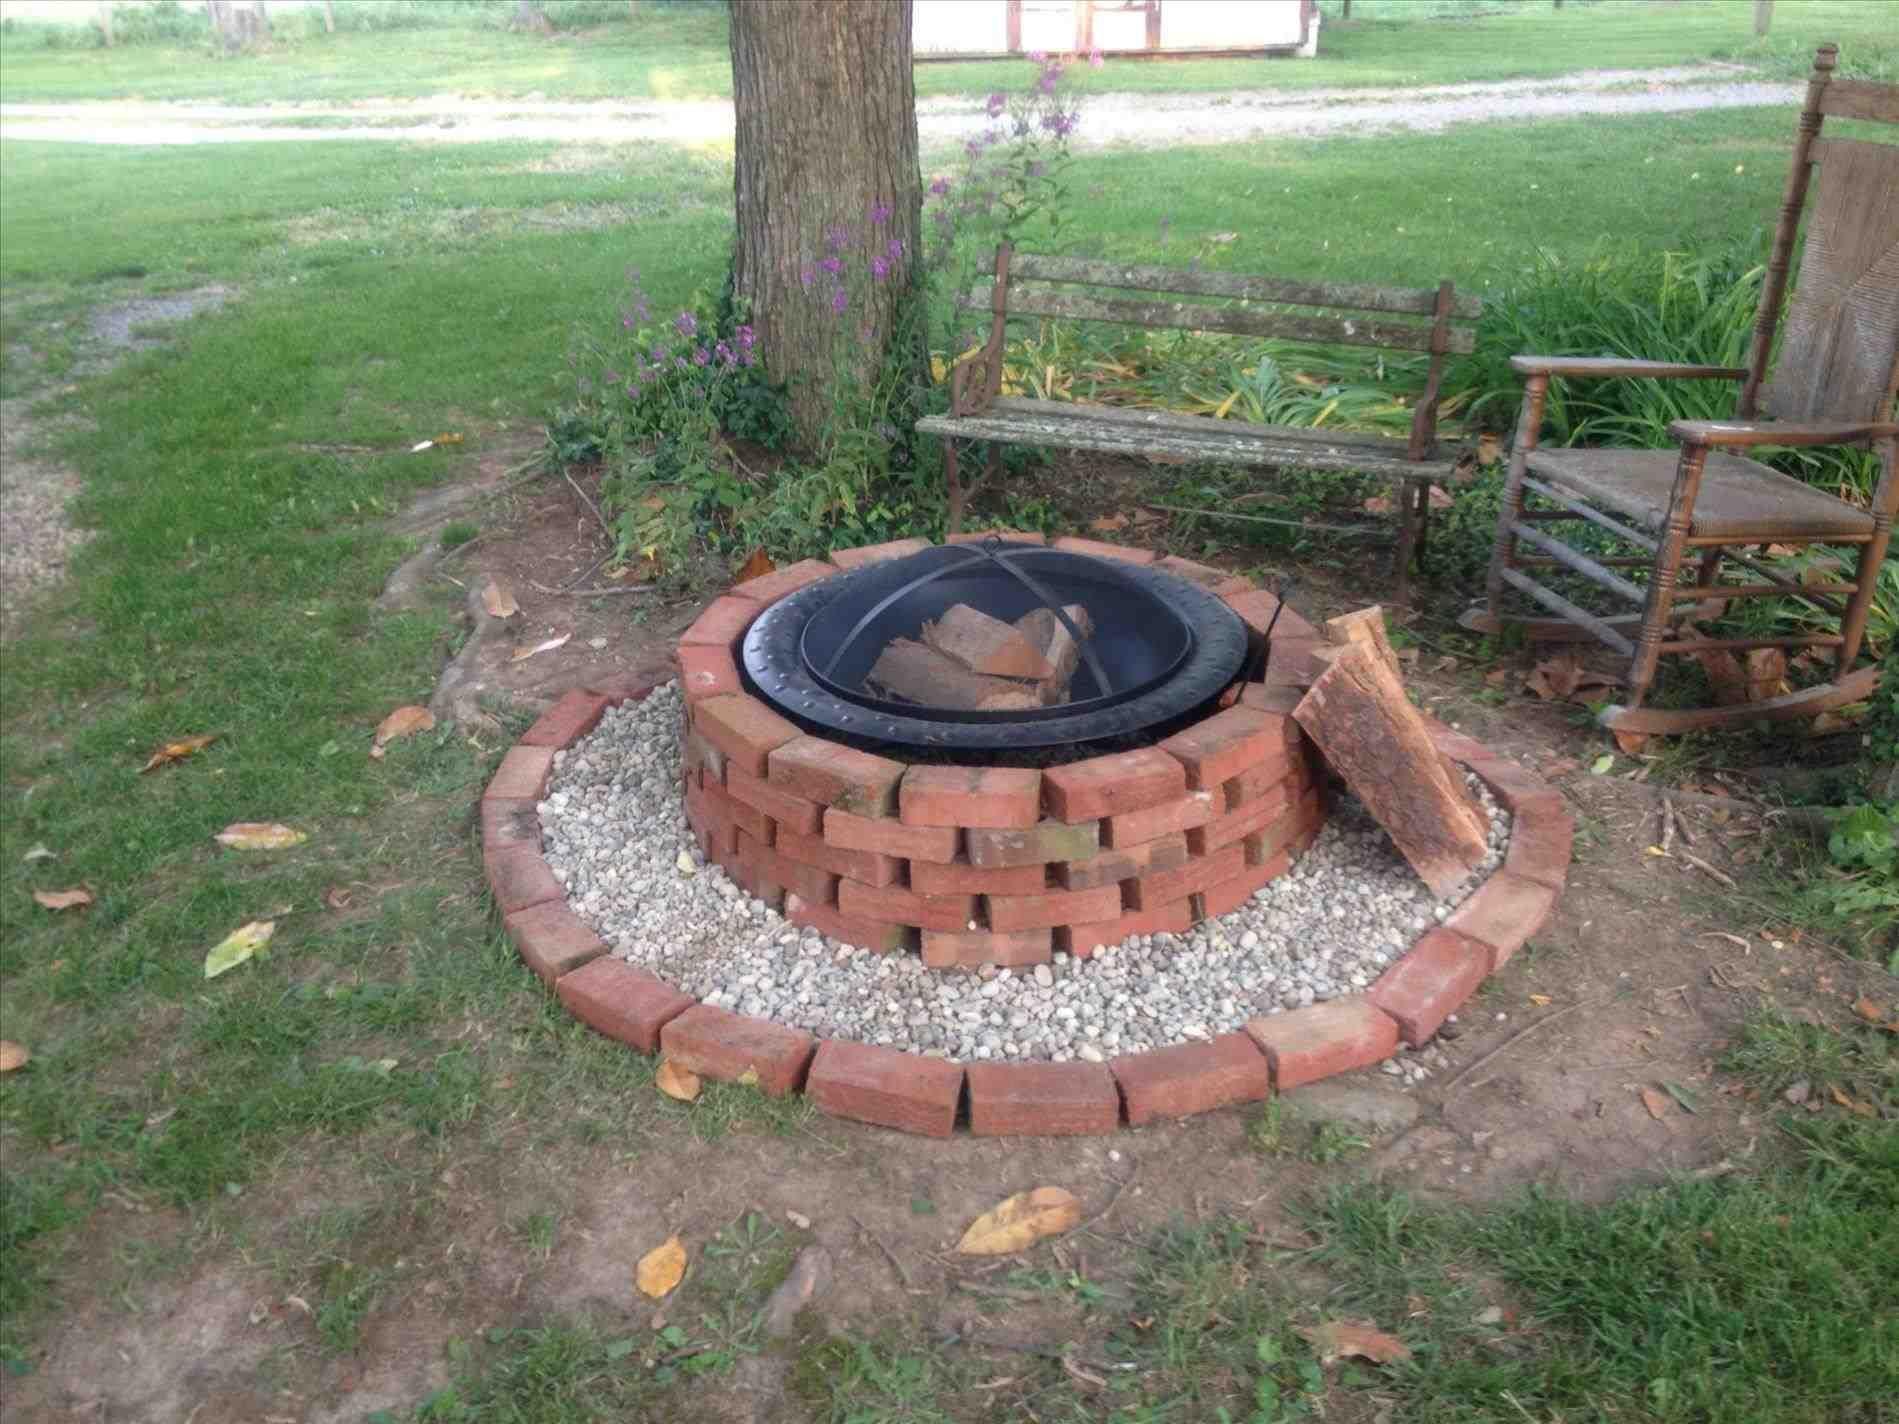 53 Minimalist Backyard Fire Pit Landscaping Ideas On A Budget Backyard Ideas Design Decor Deck Designs Backyard Backyard Seating Patio